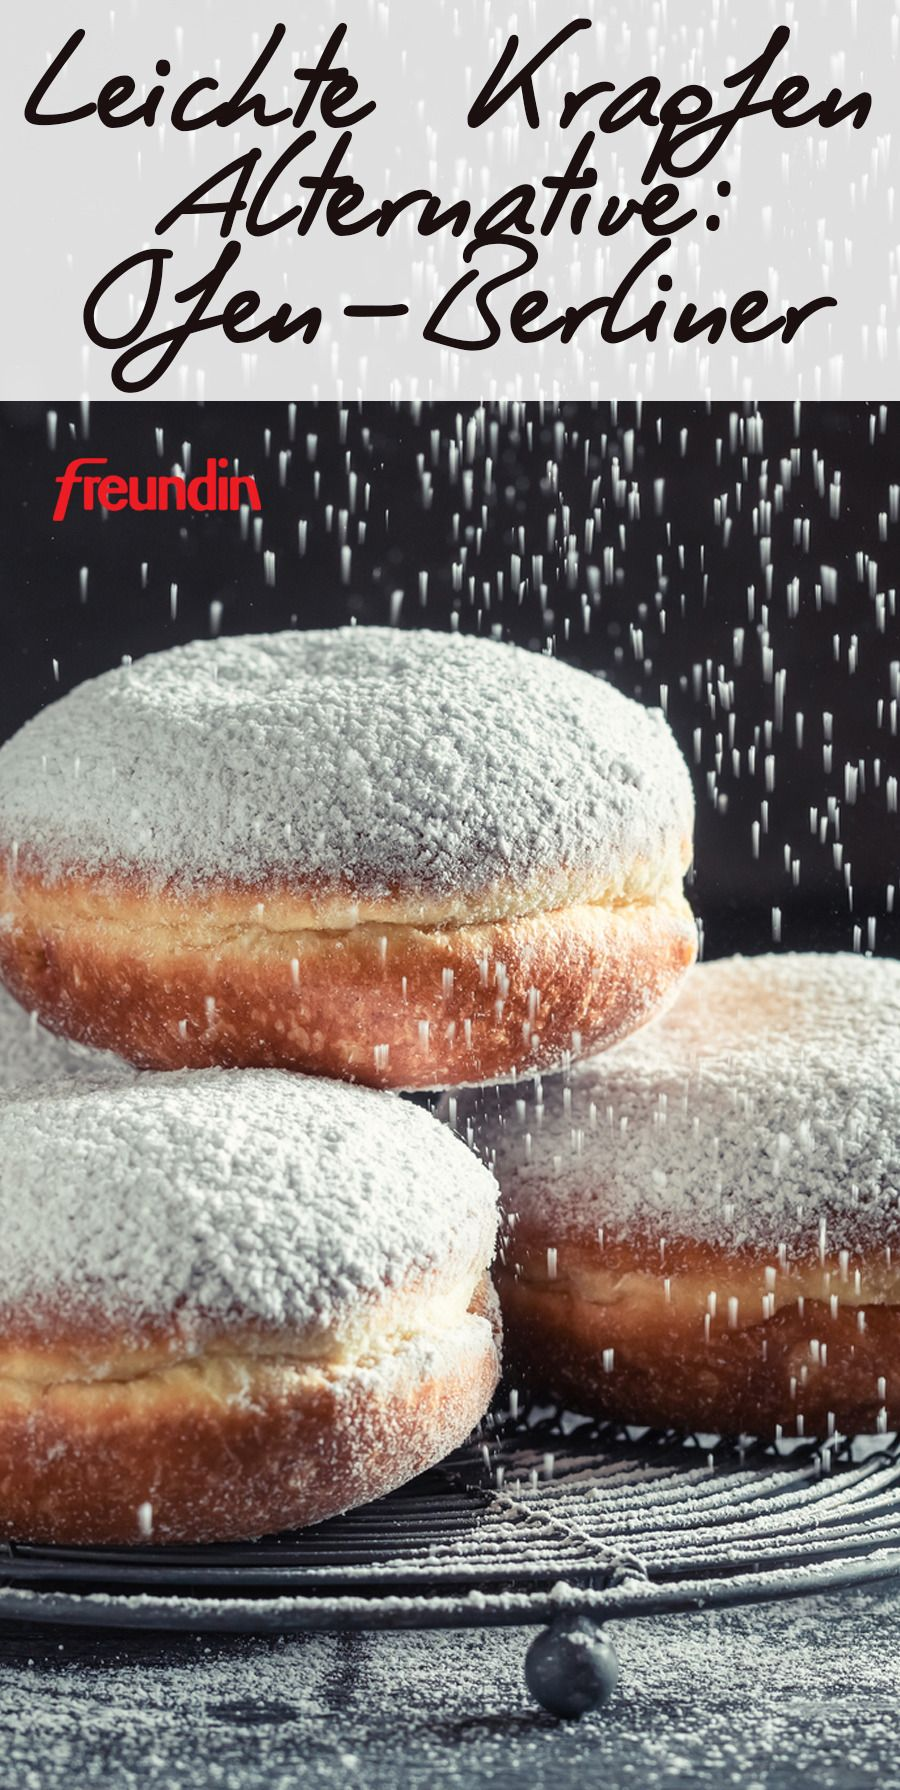 Photo of Light donut alternative: Ofen-Berliner   freundin.de